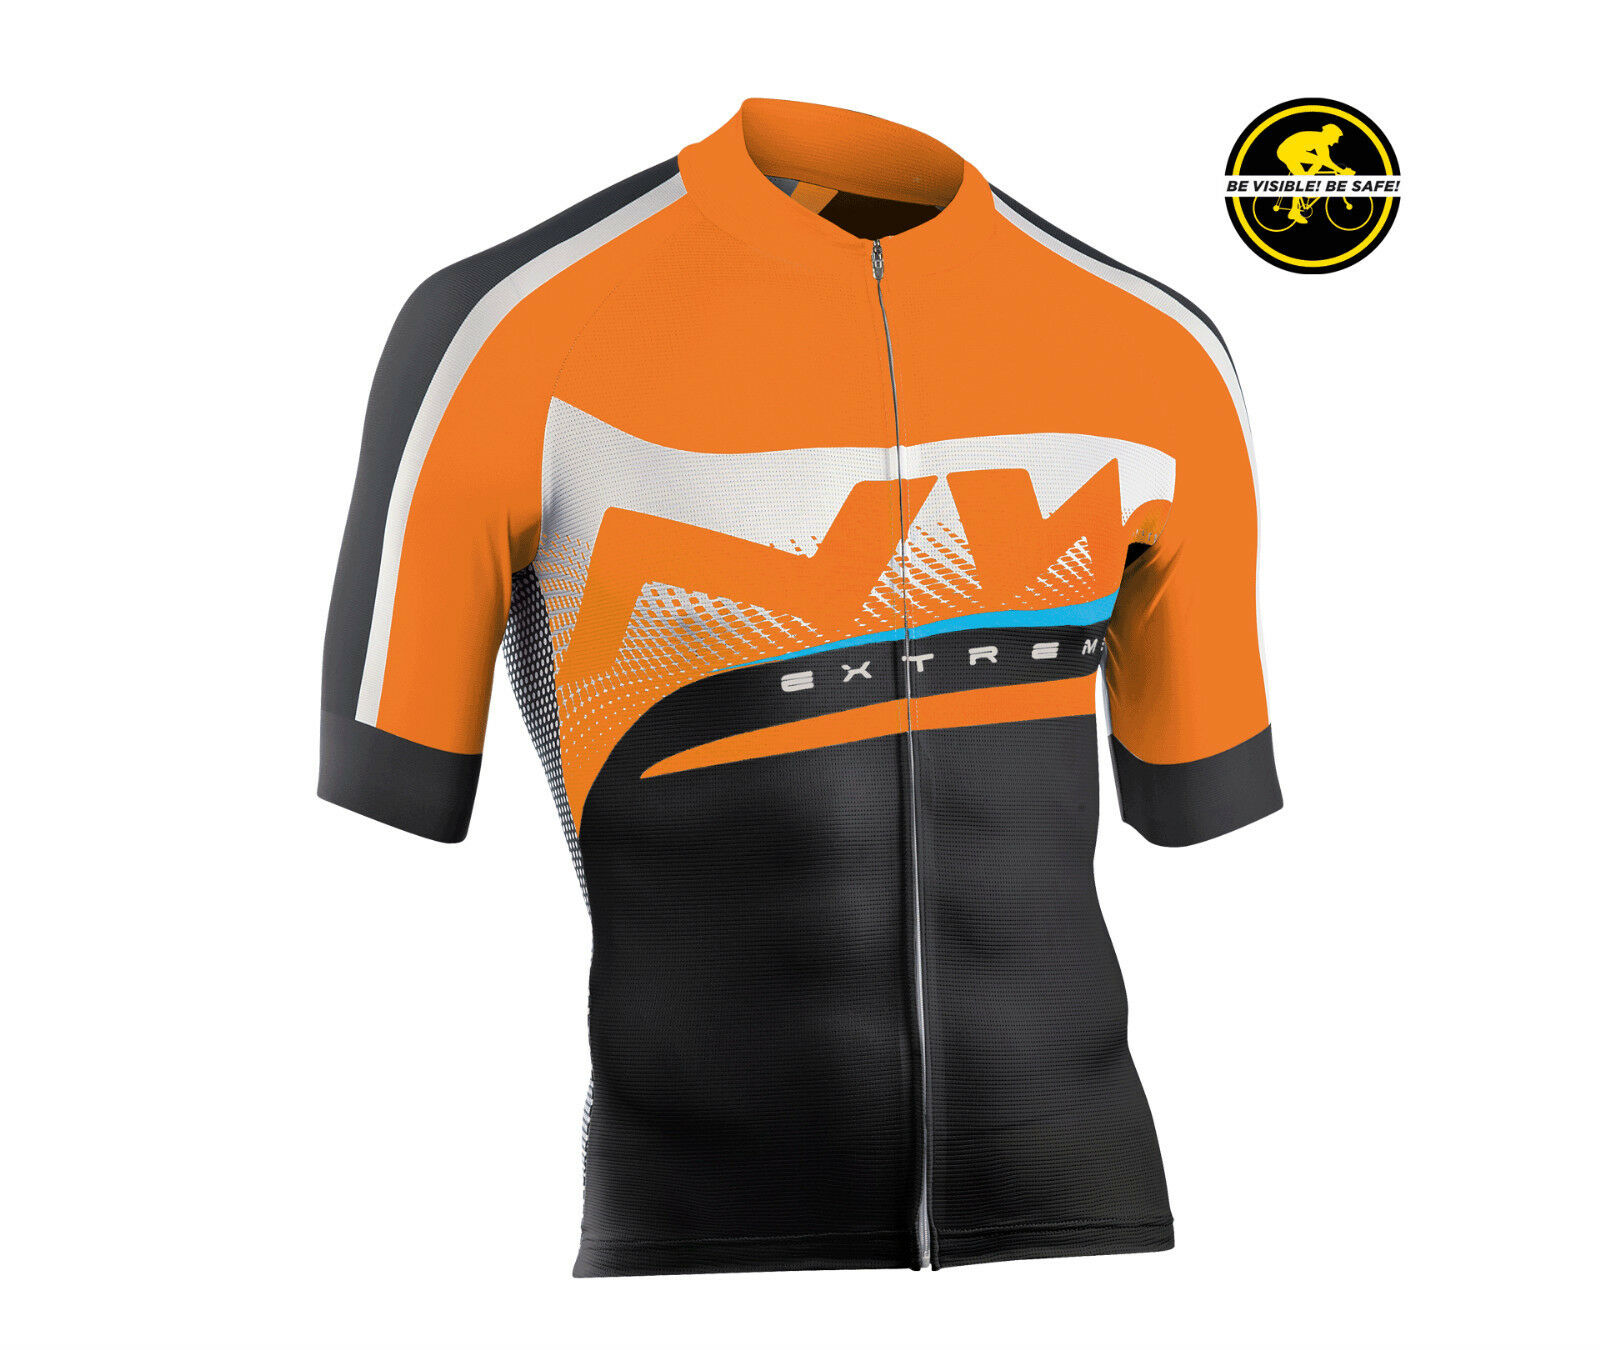 Camiseta Manga Corta NORTHWAVE EXTREME GRÁFICO black orange Fluo JERSEY